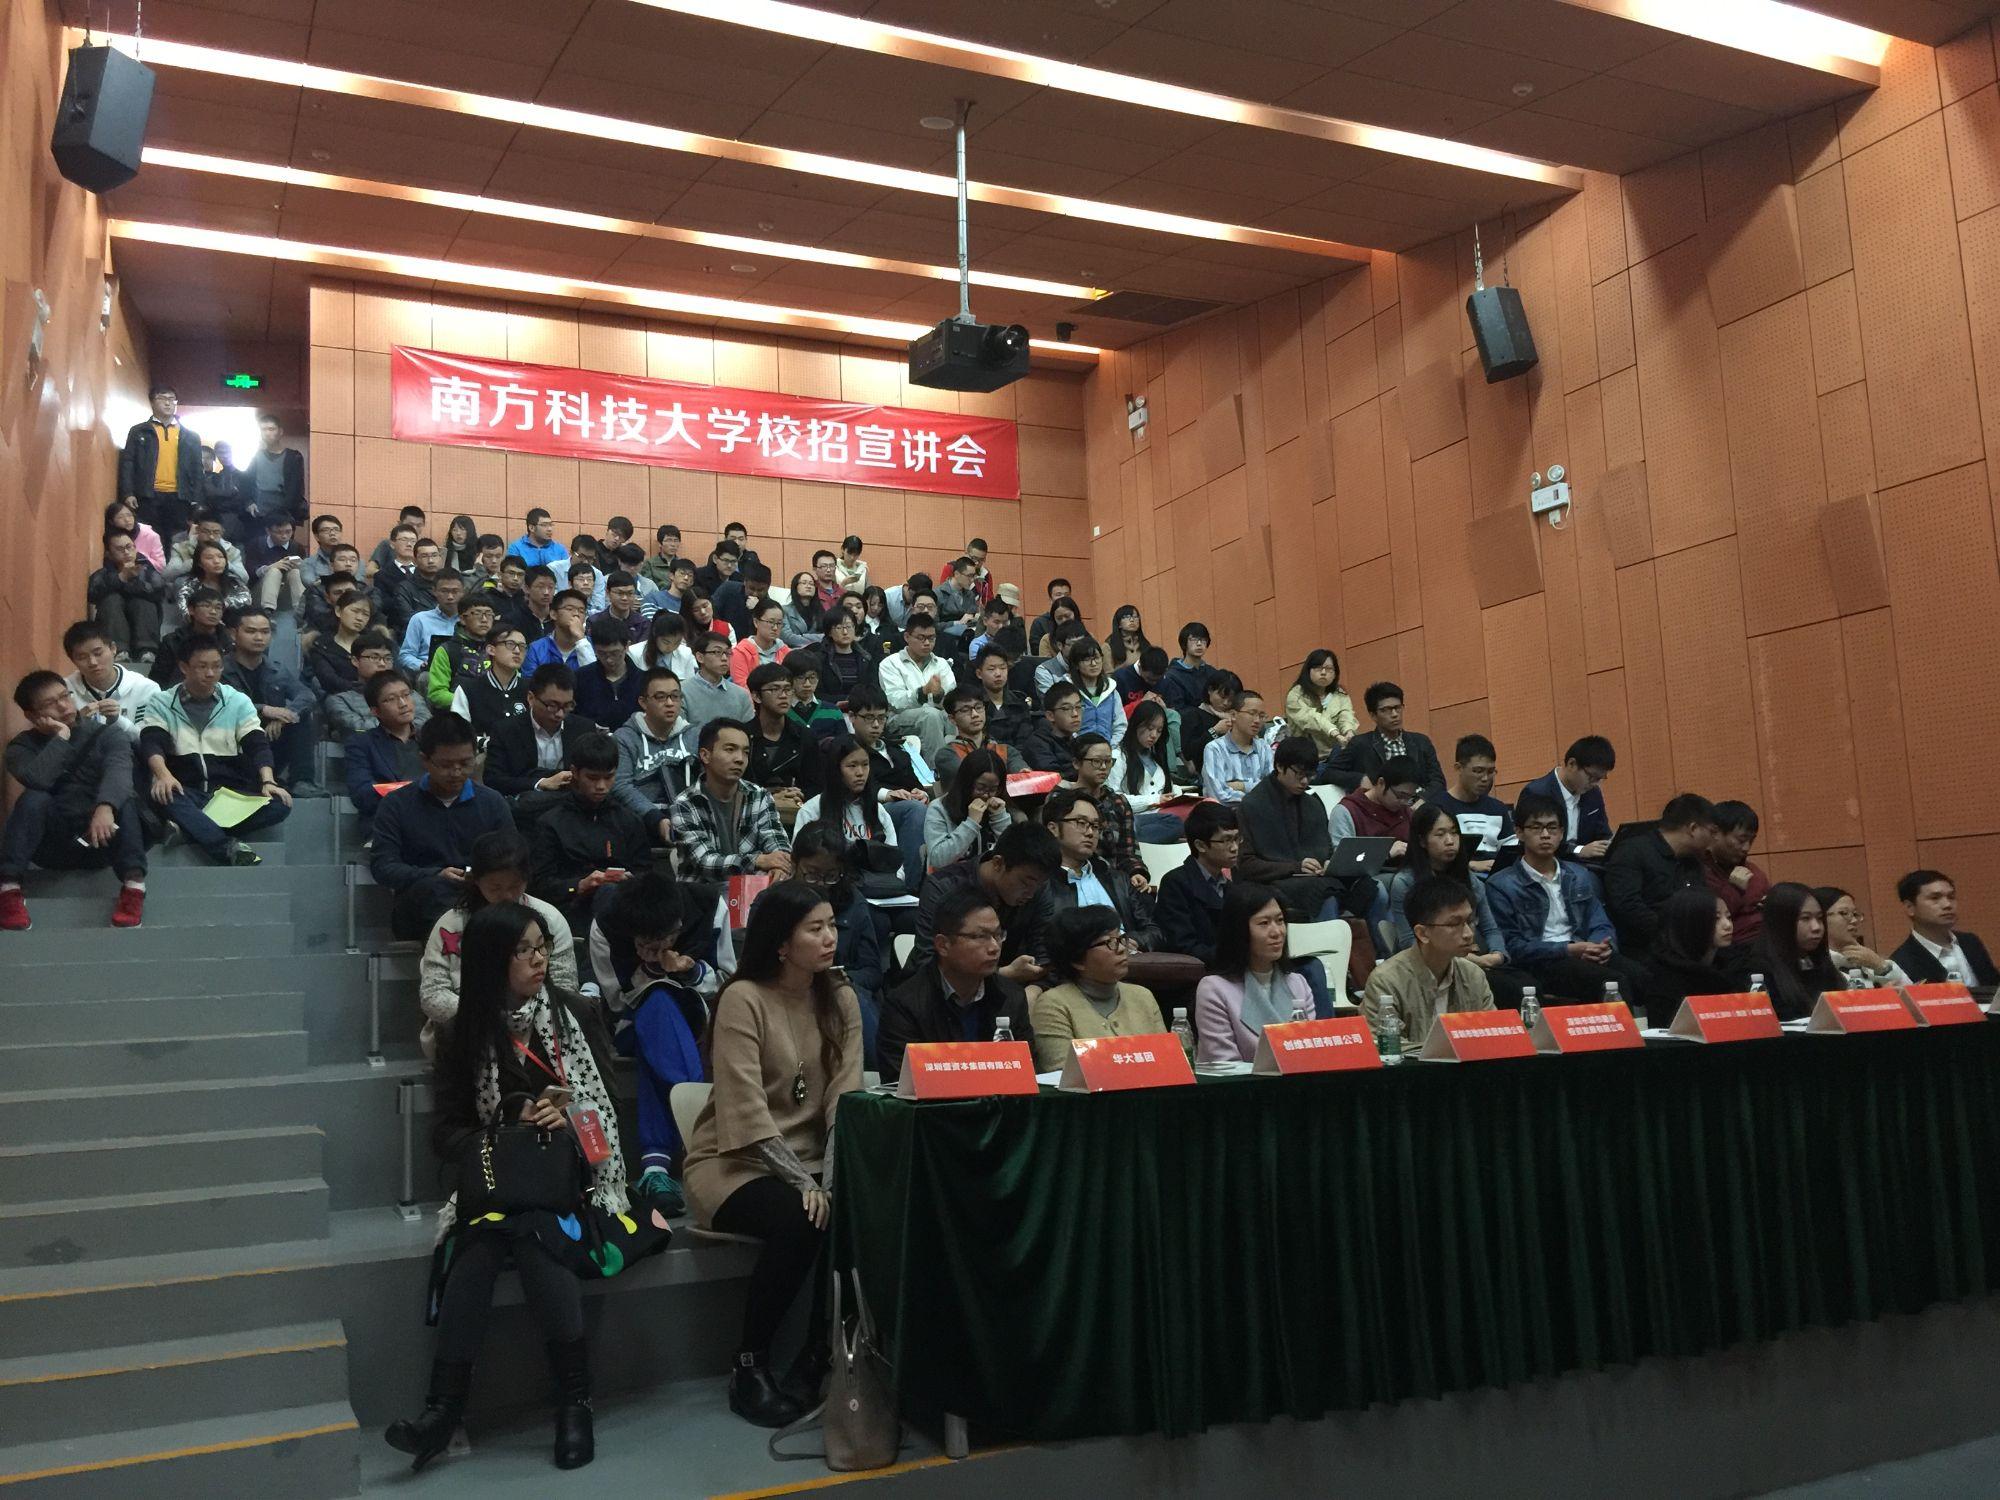 SUSTC holds 1st graduate recruitment presentations